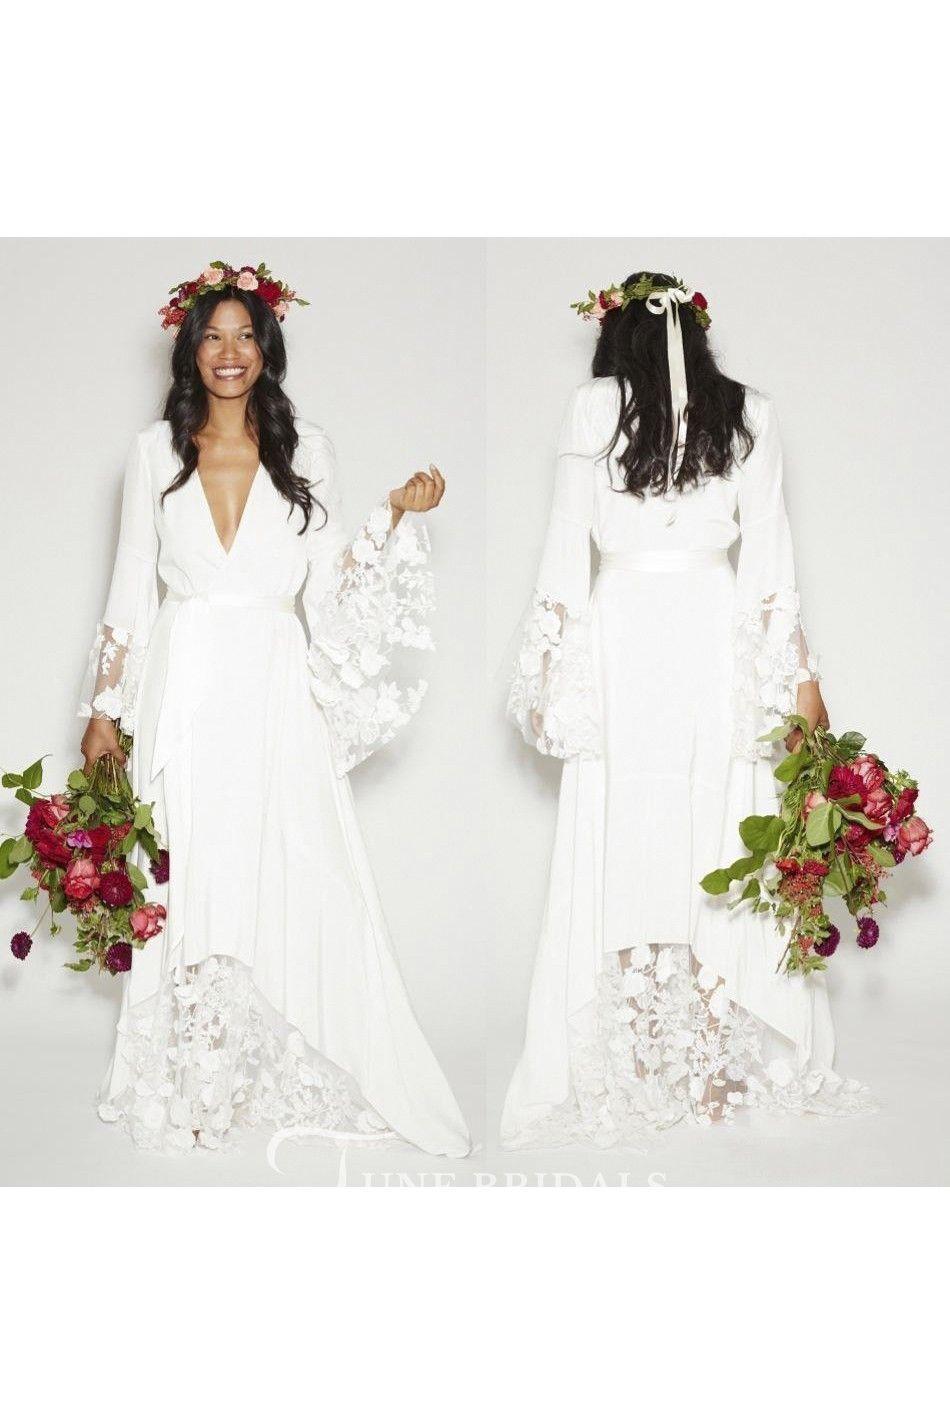 Pin By Hespy On Wedding Bridesmaid Dresses Boho Wedding Dress Long Sleeve Lace Dress Boho [ 1425 x 950 Pixel ]